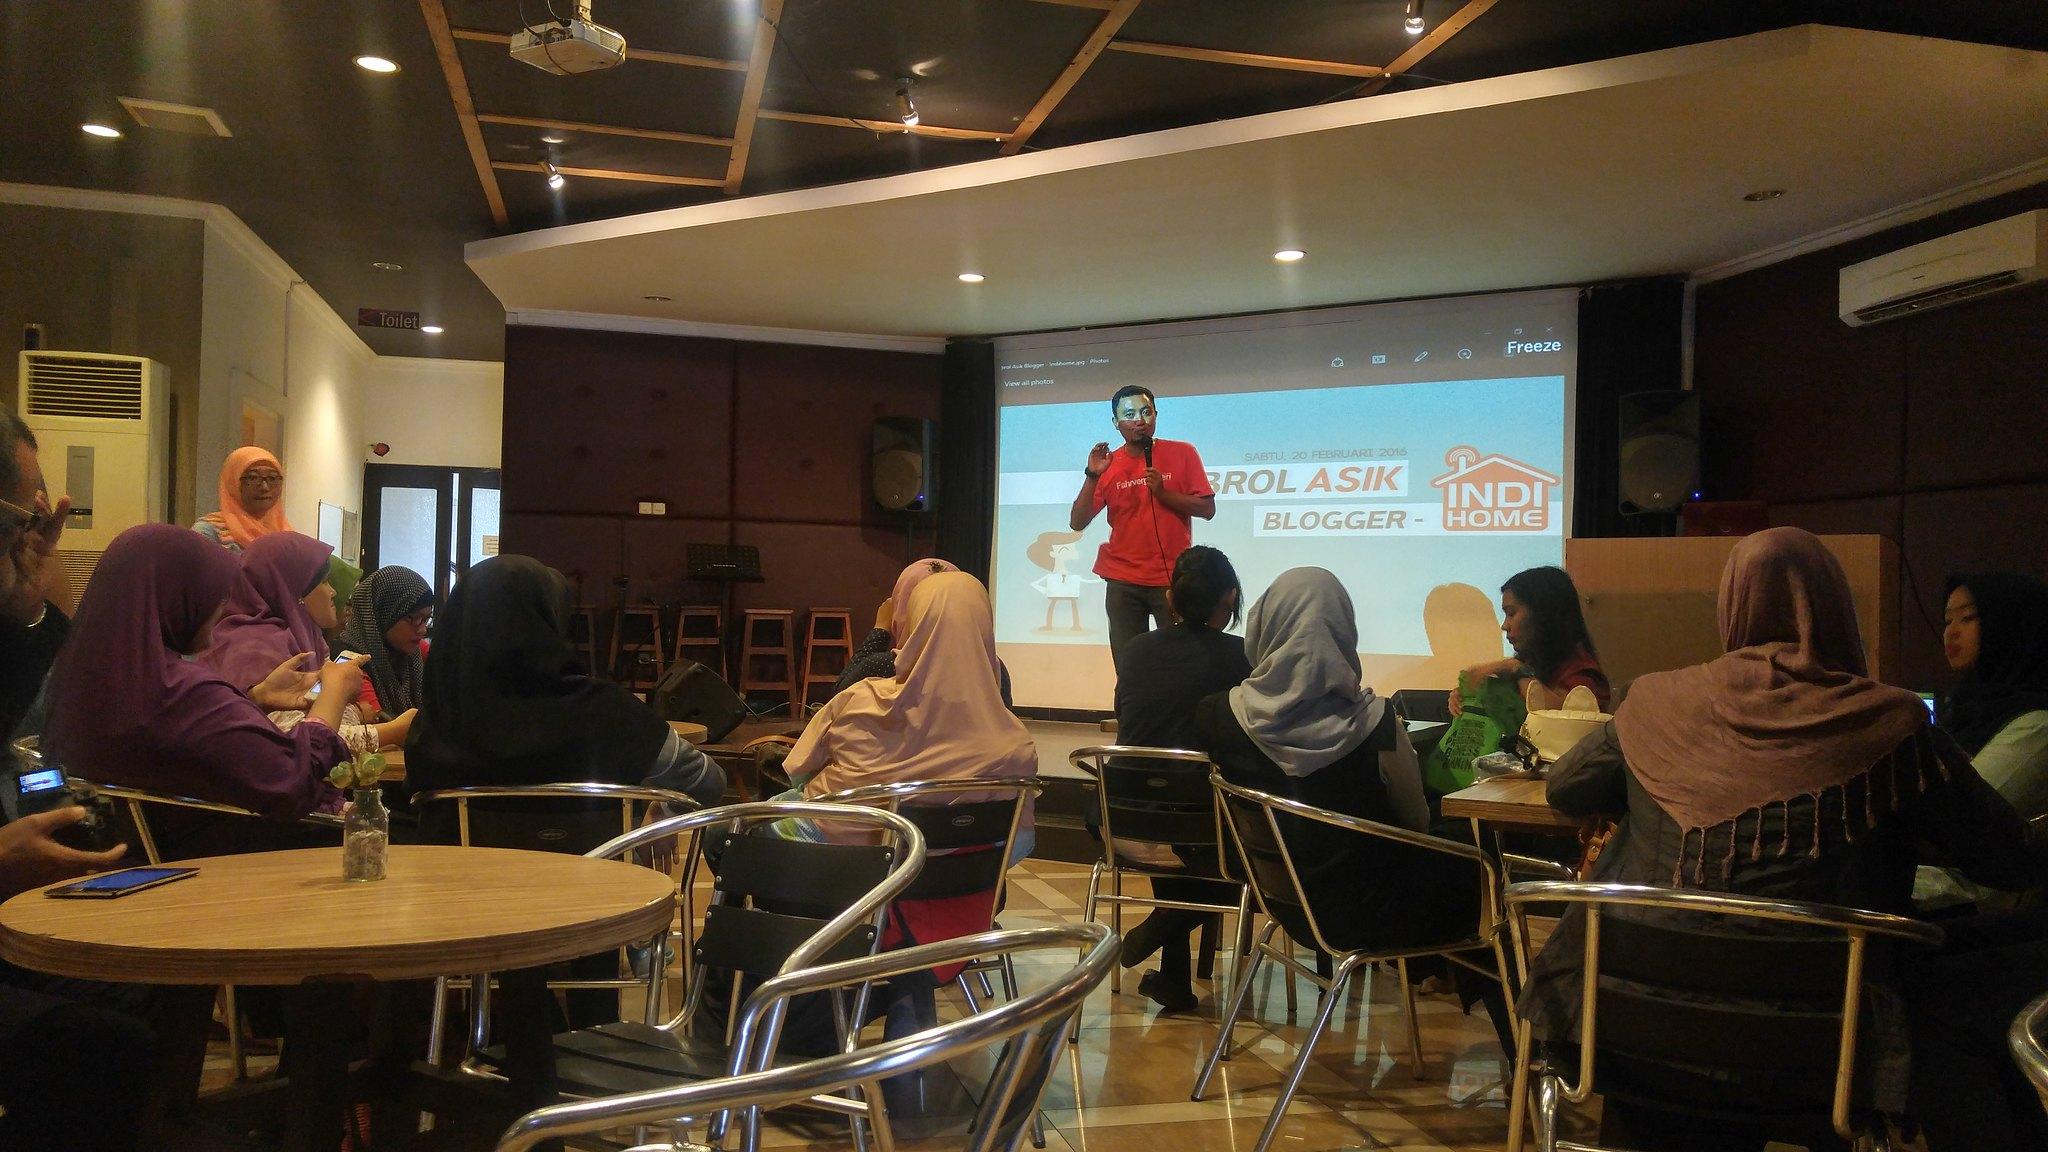 Blogger Surabaya Iyorikharismablog Handphone Di Hotel Santika Pandegiling Asik Banget Acaranya Mana Waktu Pulang Dapet Doorprize Pula Huahaha Karena Berpikiran Acara Kali Ini